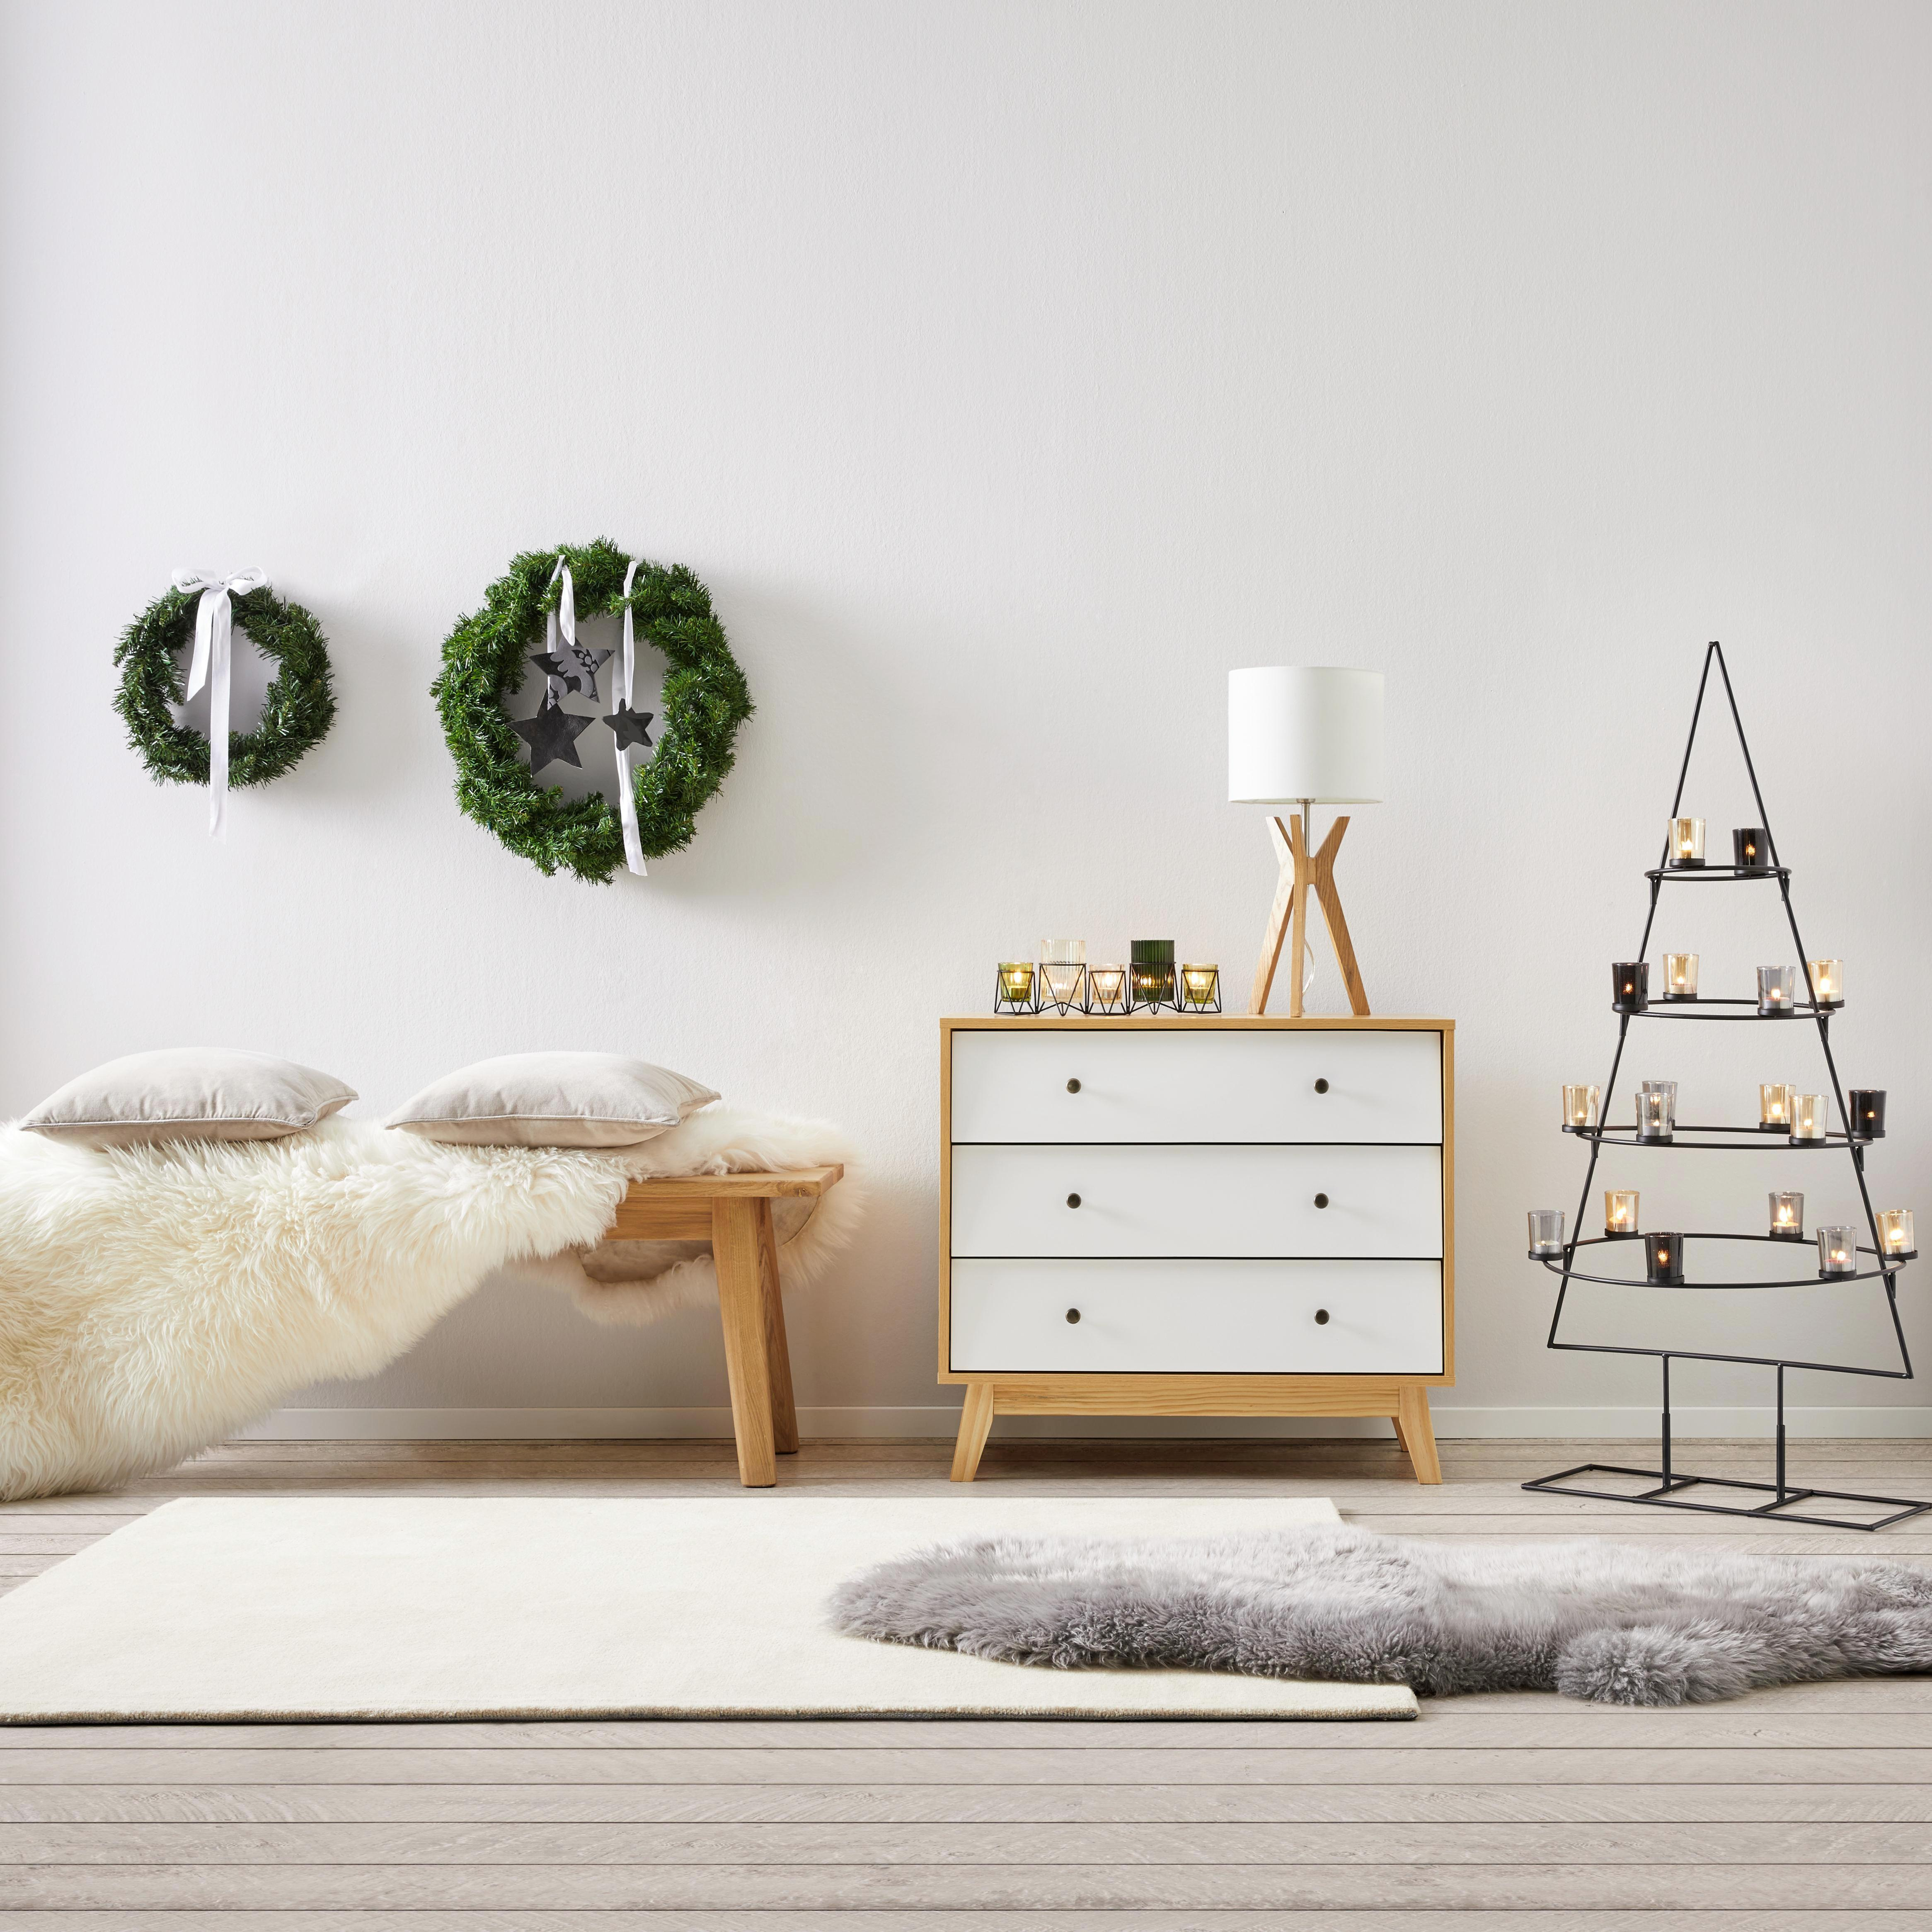 Handwebteppich Carolin 120x170cm - Naturfarben, MODERN, Textil (120/170cm) - MÖMAX modern living